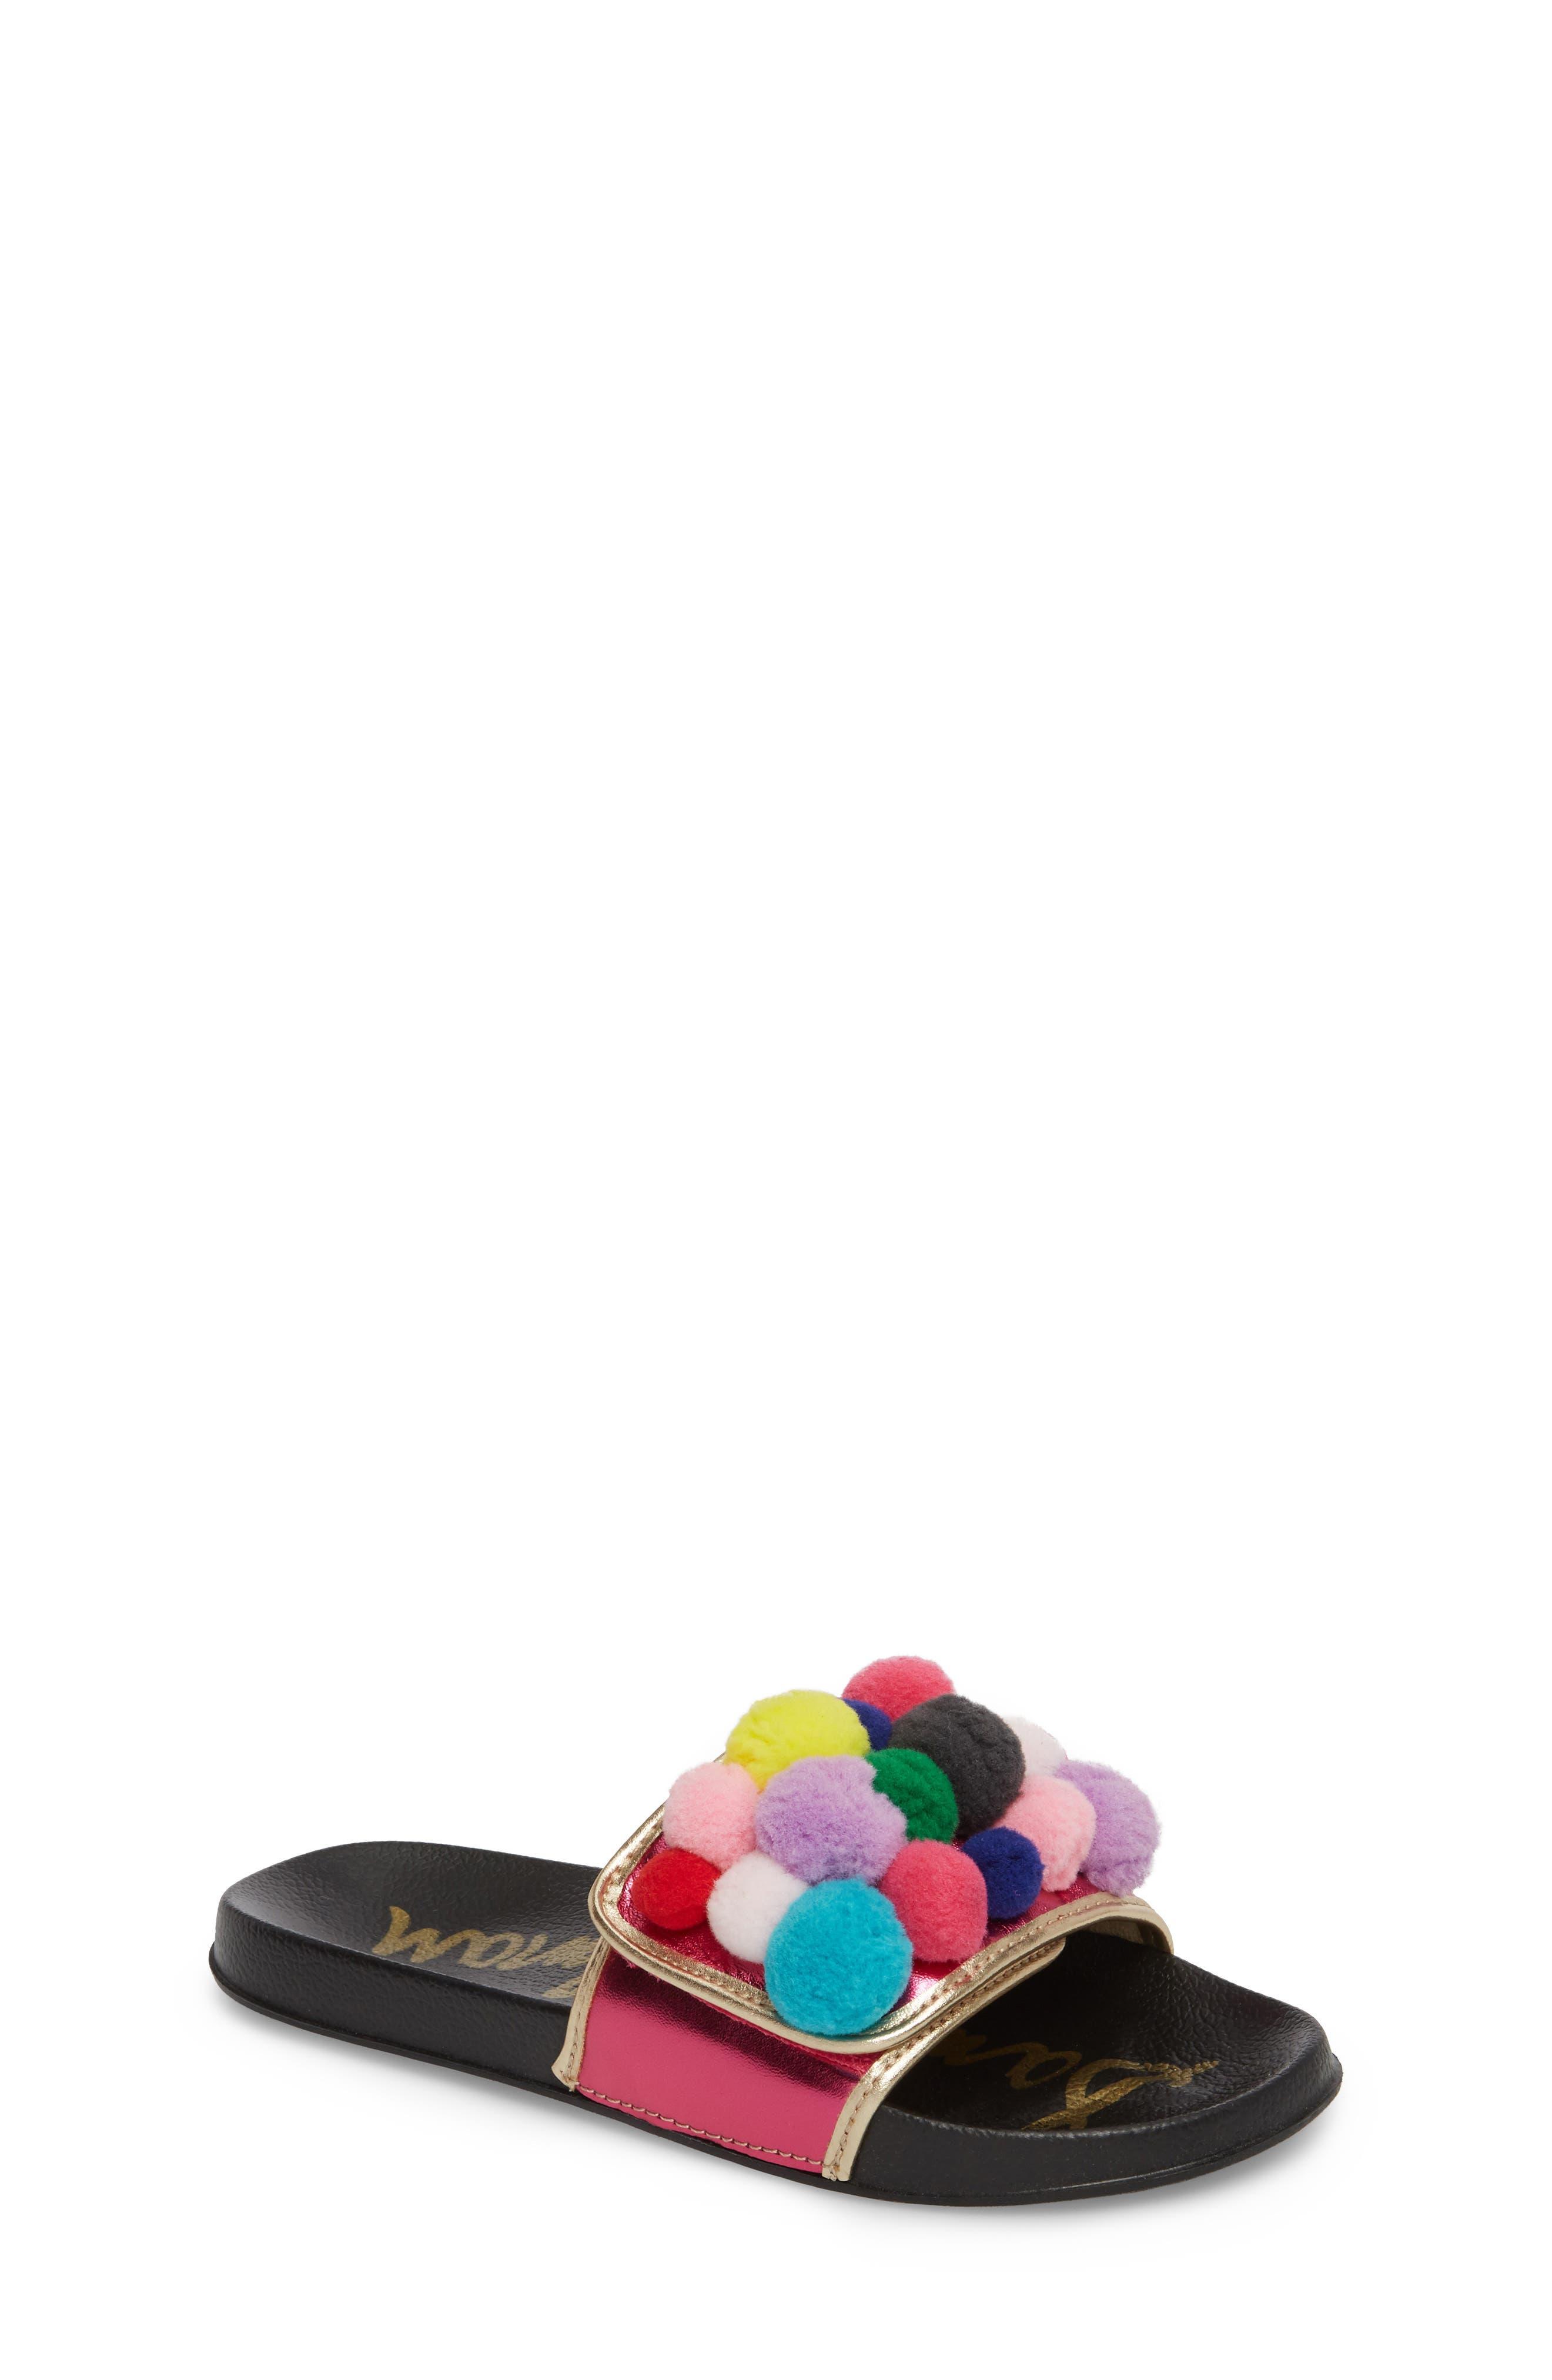 Sam Edelman Faux Fur Mackie Cayman Sandal (Toddler, Little Kid & Big Kid)